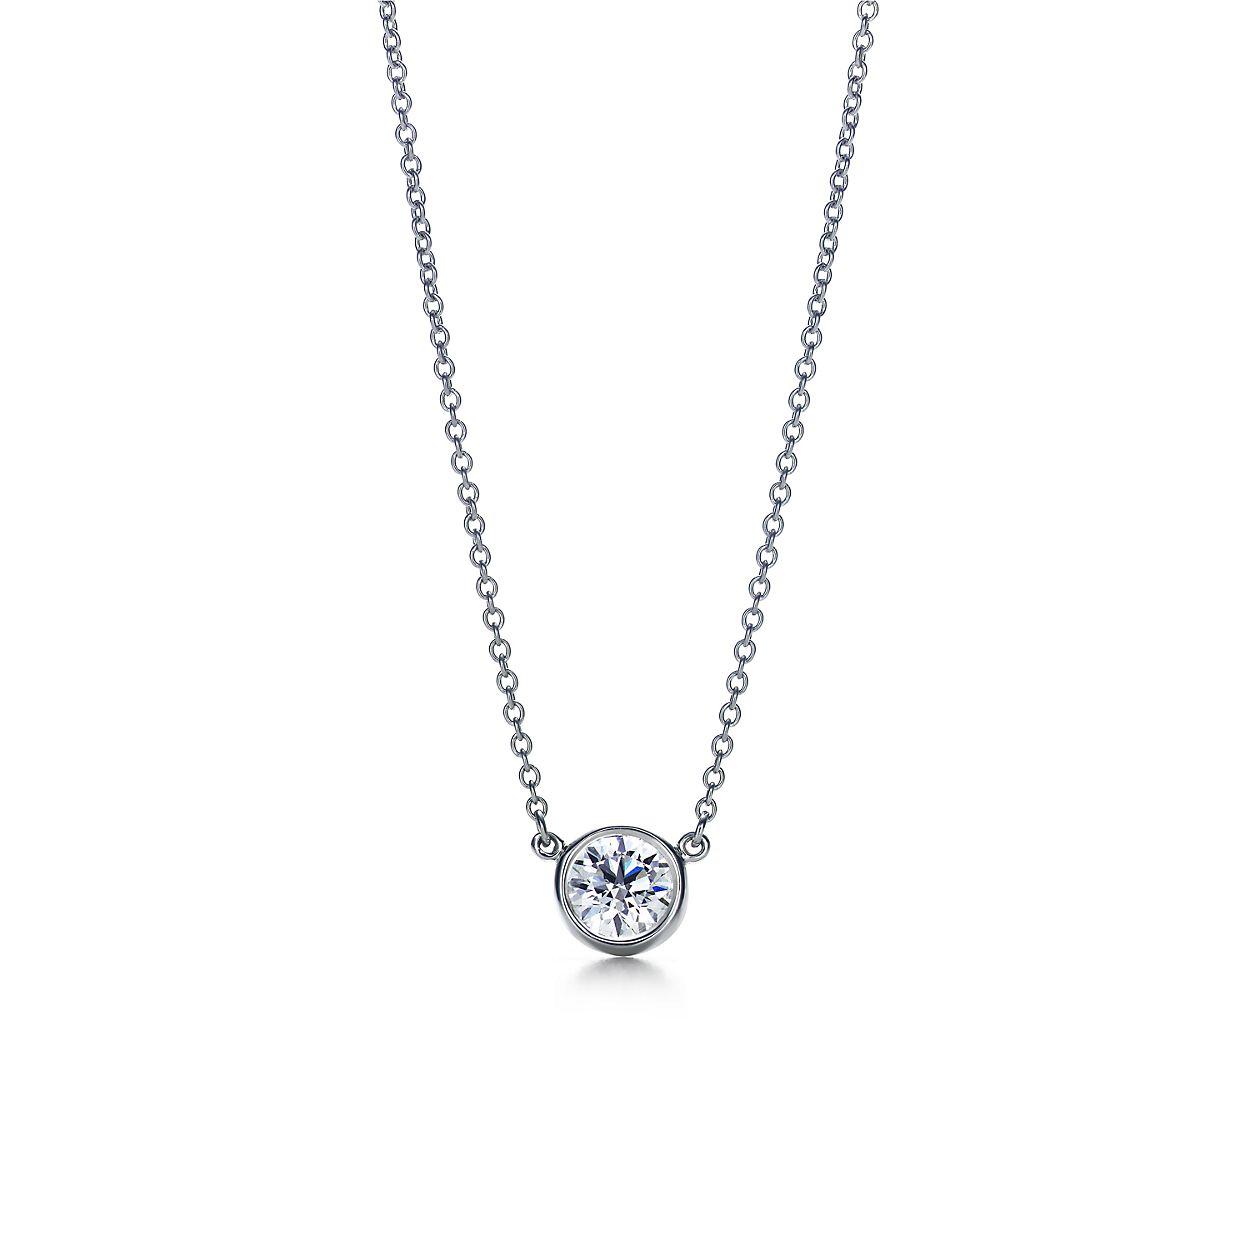 Elsa Peretti Diamonds by the Yard pendant in platinum Tiffany & Co. O8kCVbM2N